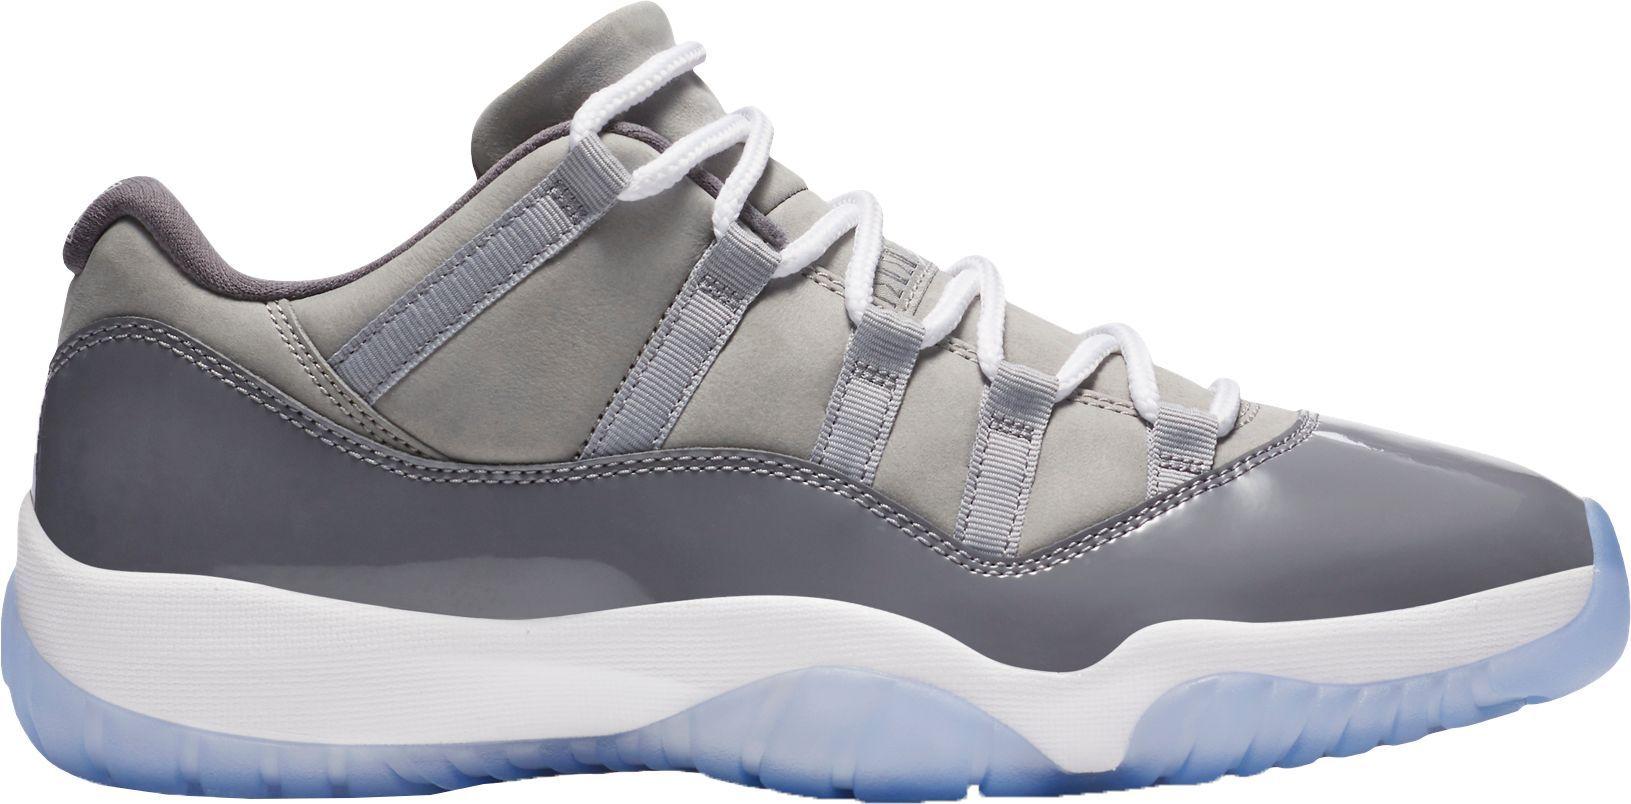 ec36a079e6422 Jordan Mens Air Jordan 11 Retro Low Basketball Shoes, Size: 11.0 ...